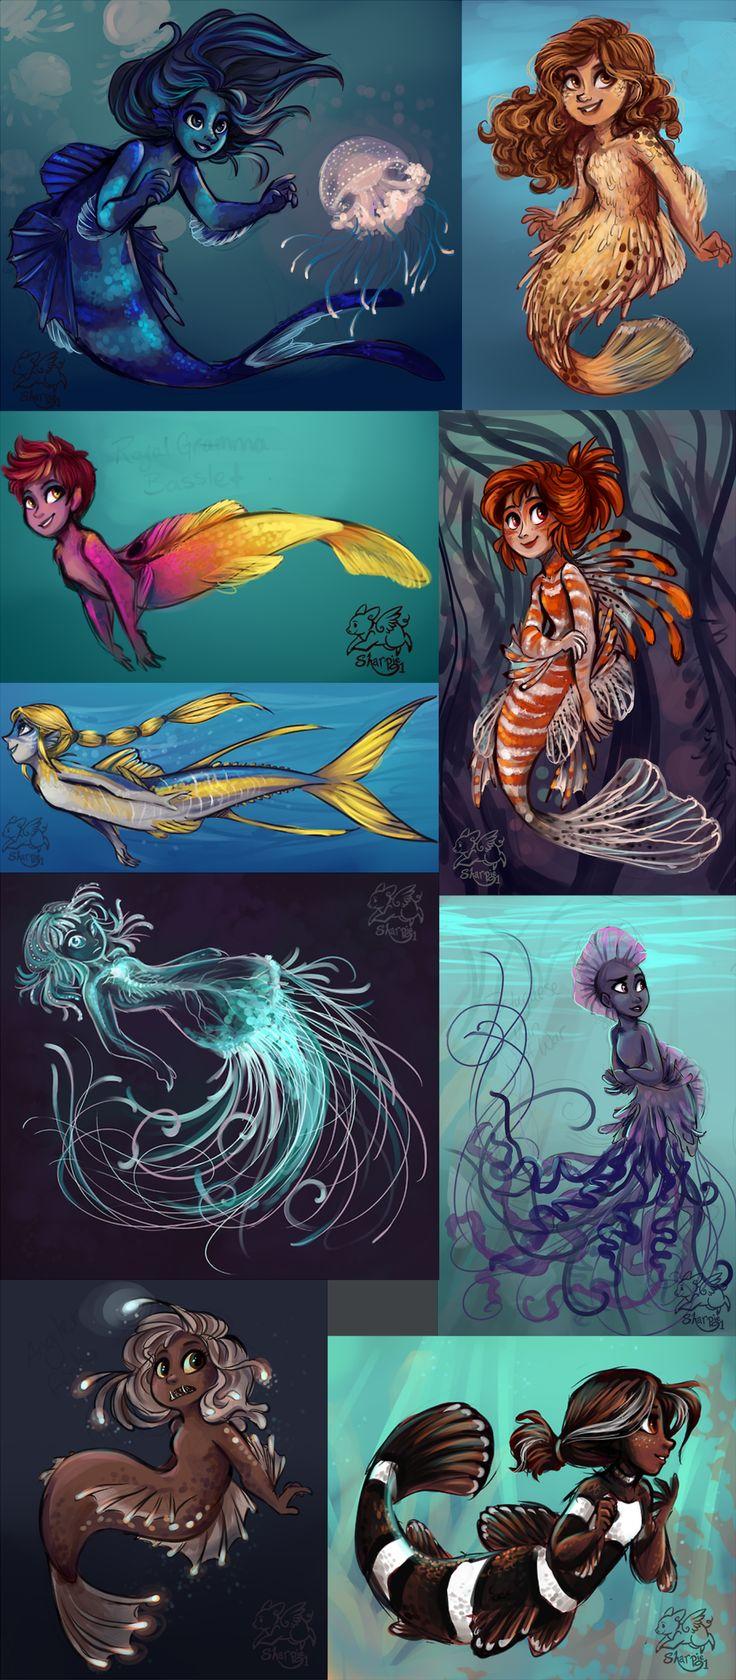 "Mermaids by sharpie91.deviantart.com on @deviantART ""A bunch of mermaids based on various marine creatures;Man of War Fish, Puffer Fish, Royal Gramma Basslet, Lion Fish, Yellowfin Tuna, Immortal Jellyfish, Portuguese Man of War (not a jellyfish), Anglerfish, Black Ocellaris Clownfish"""